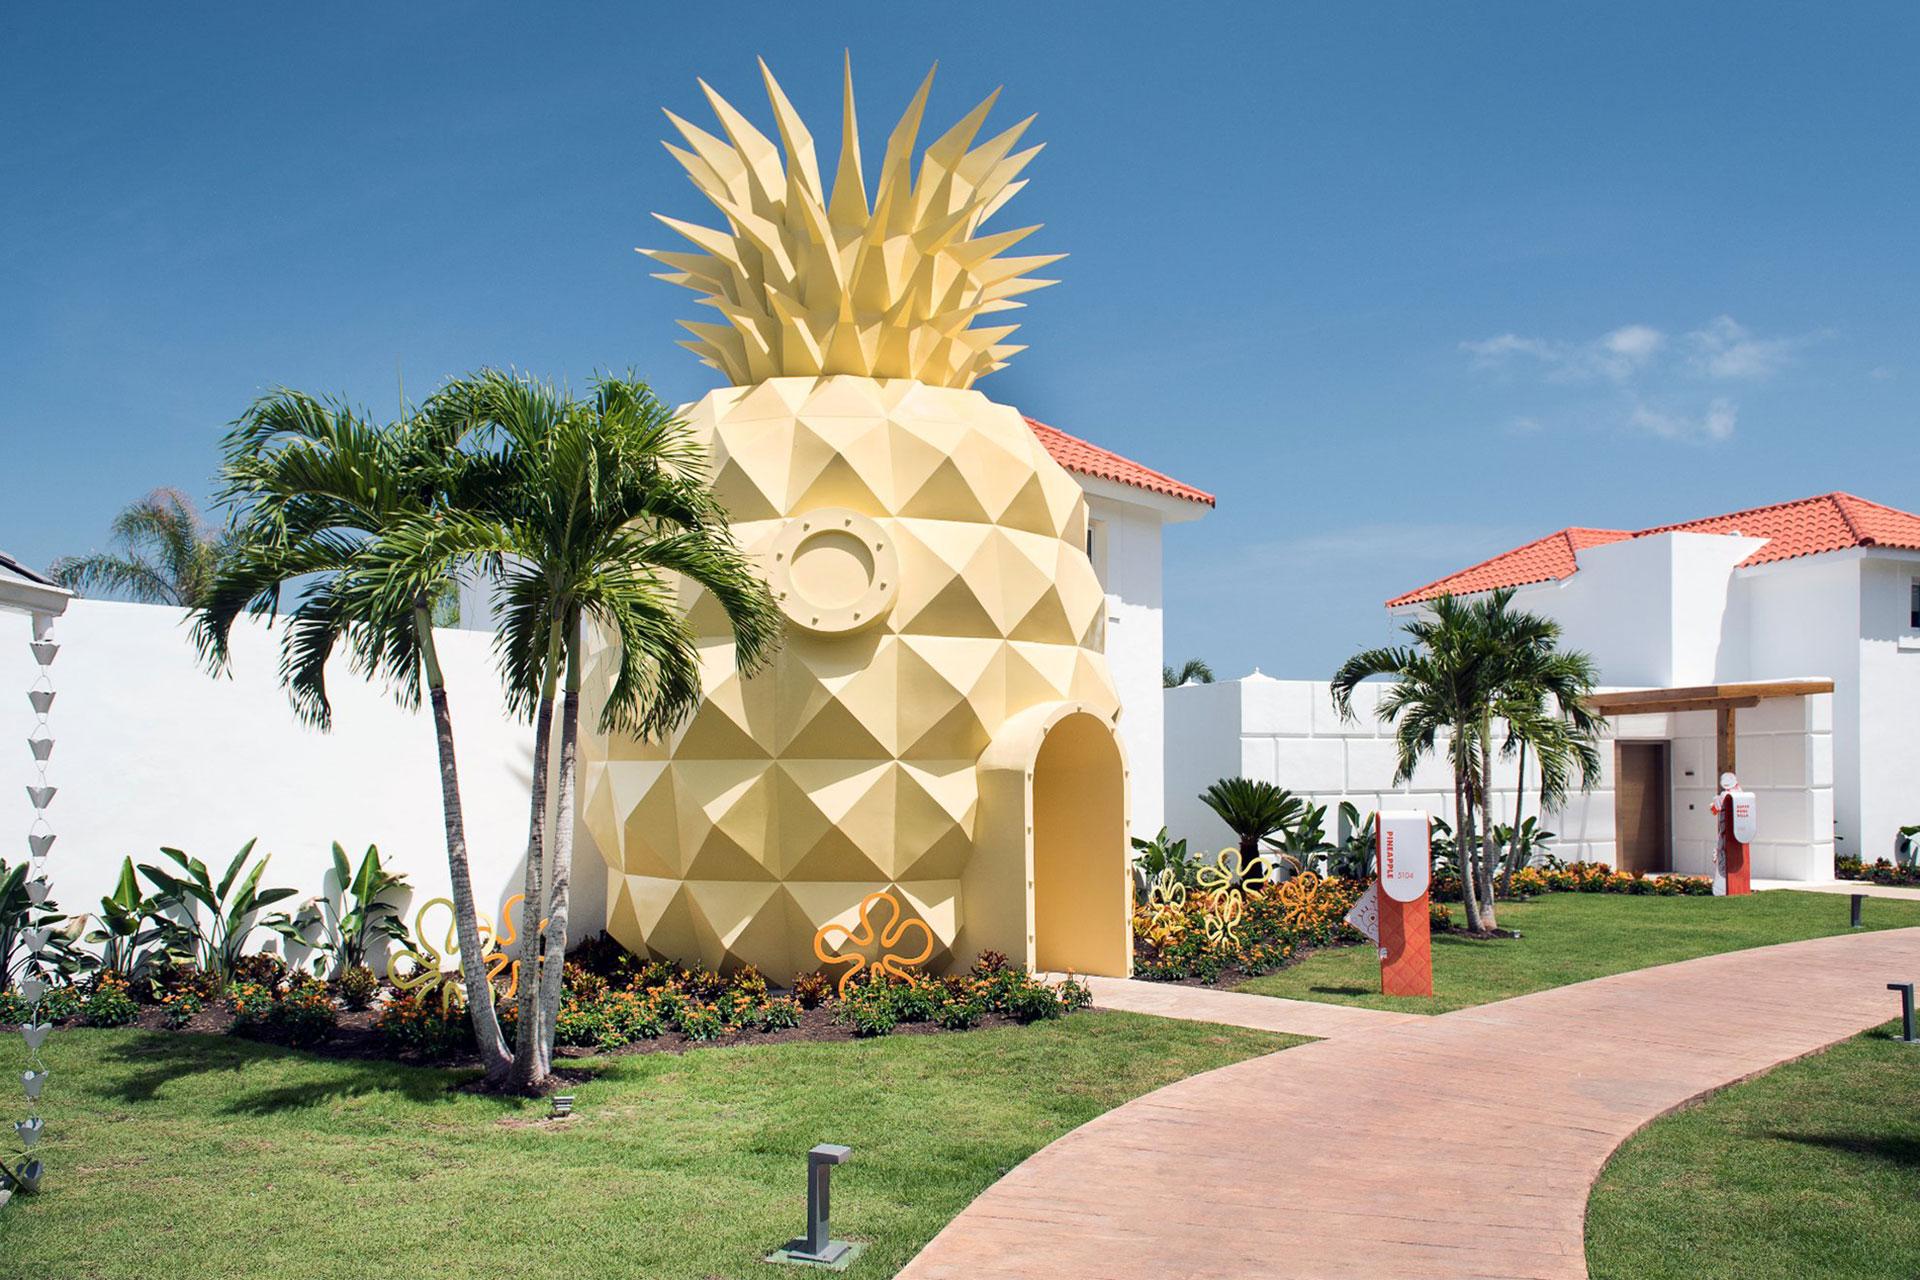 Spongebob Squarepants Suite at Nickelodeon Hotels and Resorts Punta Cana; Courtesy of Nickelodeon Hotels and Resorts Punta Cana